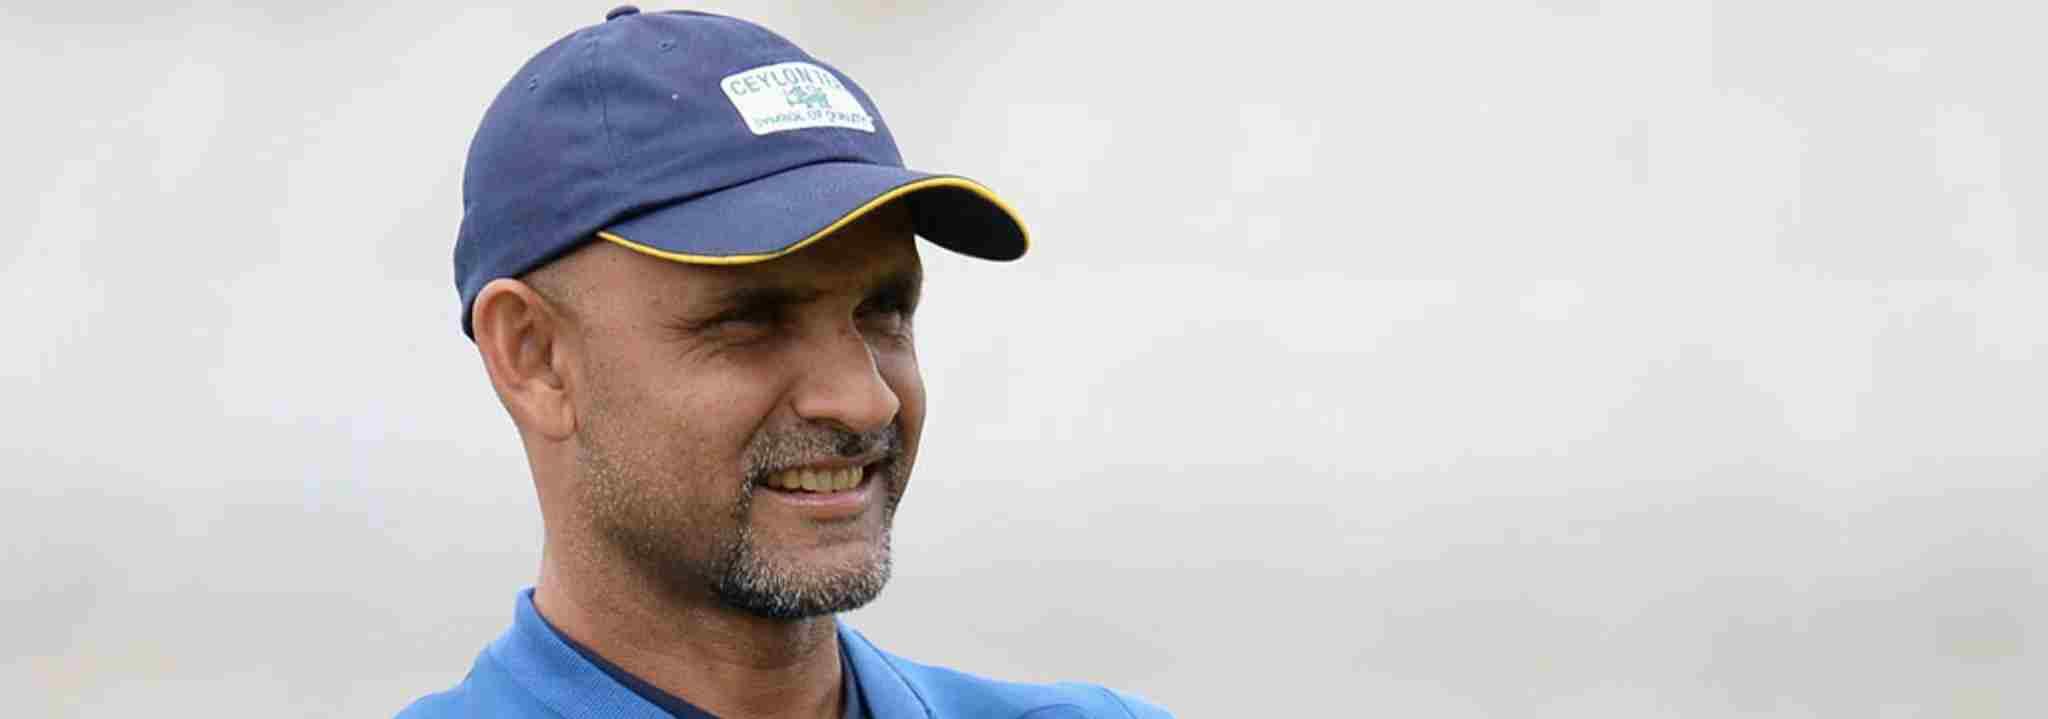 An inspiring story of Marvan Atapattu, a Srilankan Cricketer